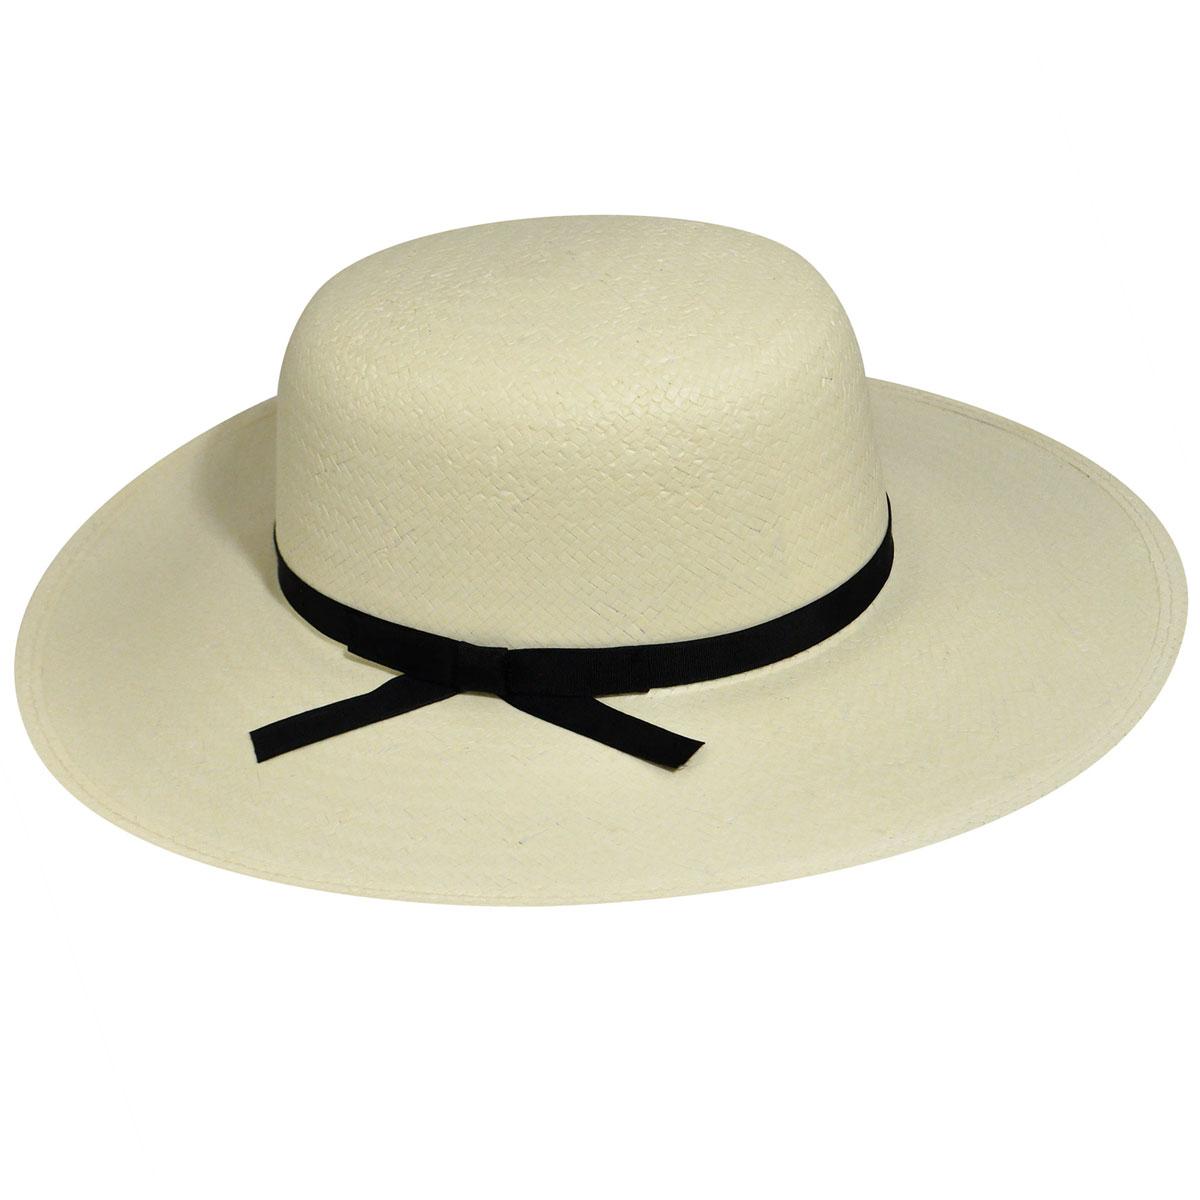 Edwardian Style Hats, Titanic Hats, Derby Hats LiteStraw reg Stephanie Wide Brim Hat $62.00 AT vintagedancer.com